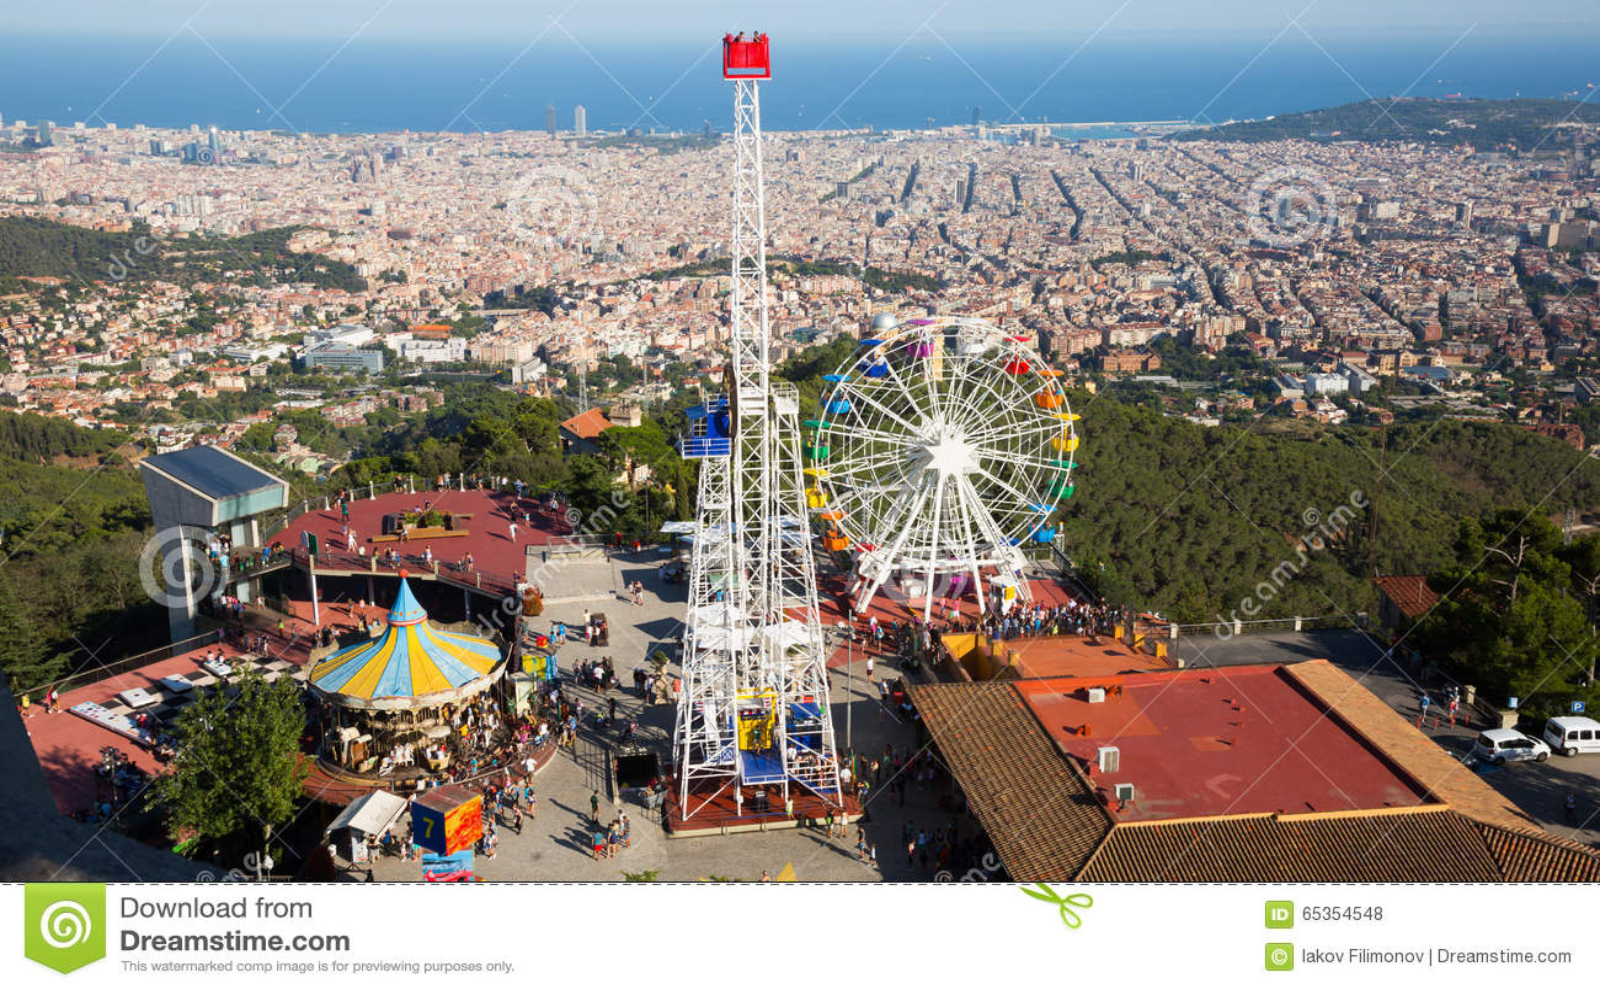 Tibidabo Amusement Park. Barcelona Editorial Stock Photo - Image: 65354548